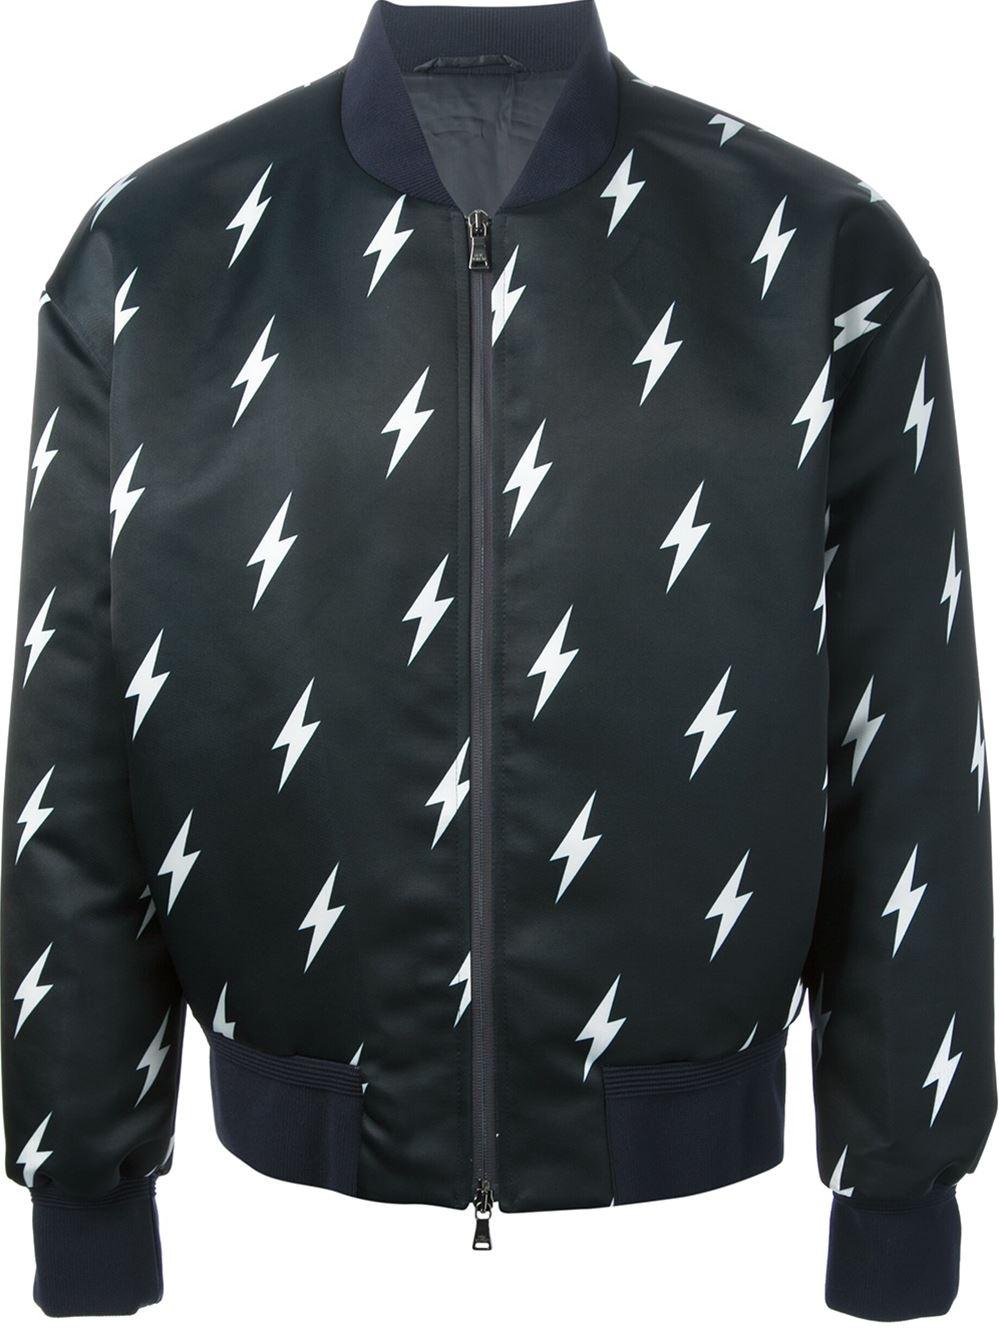 Macys Jackets